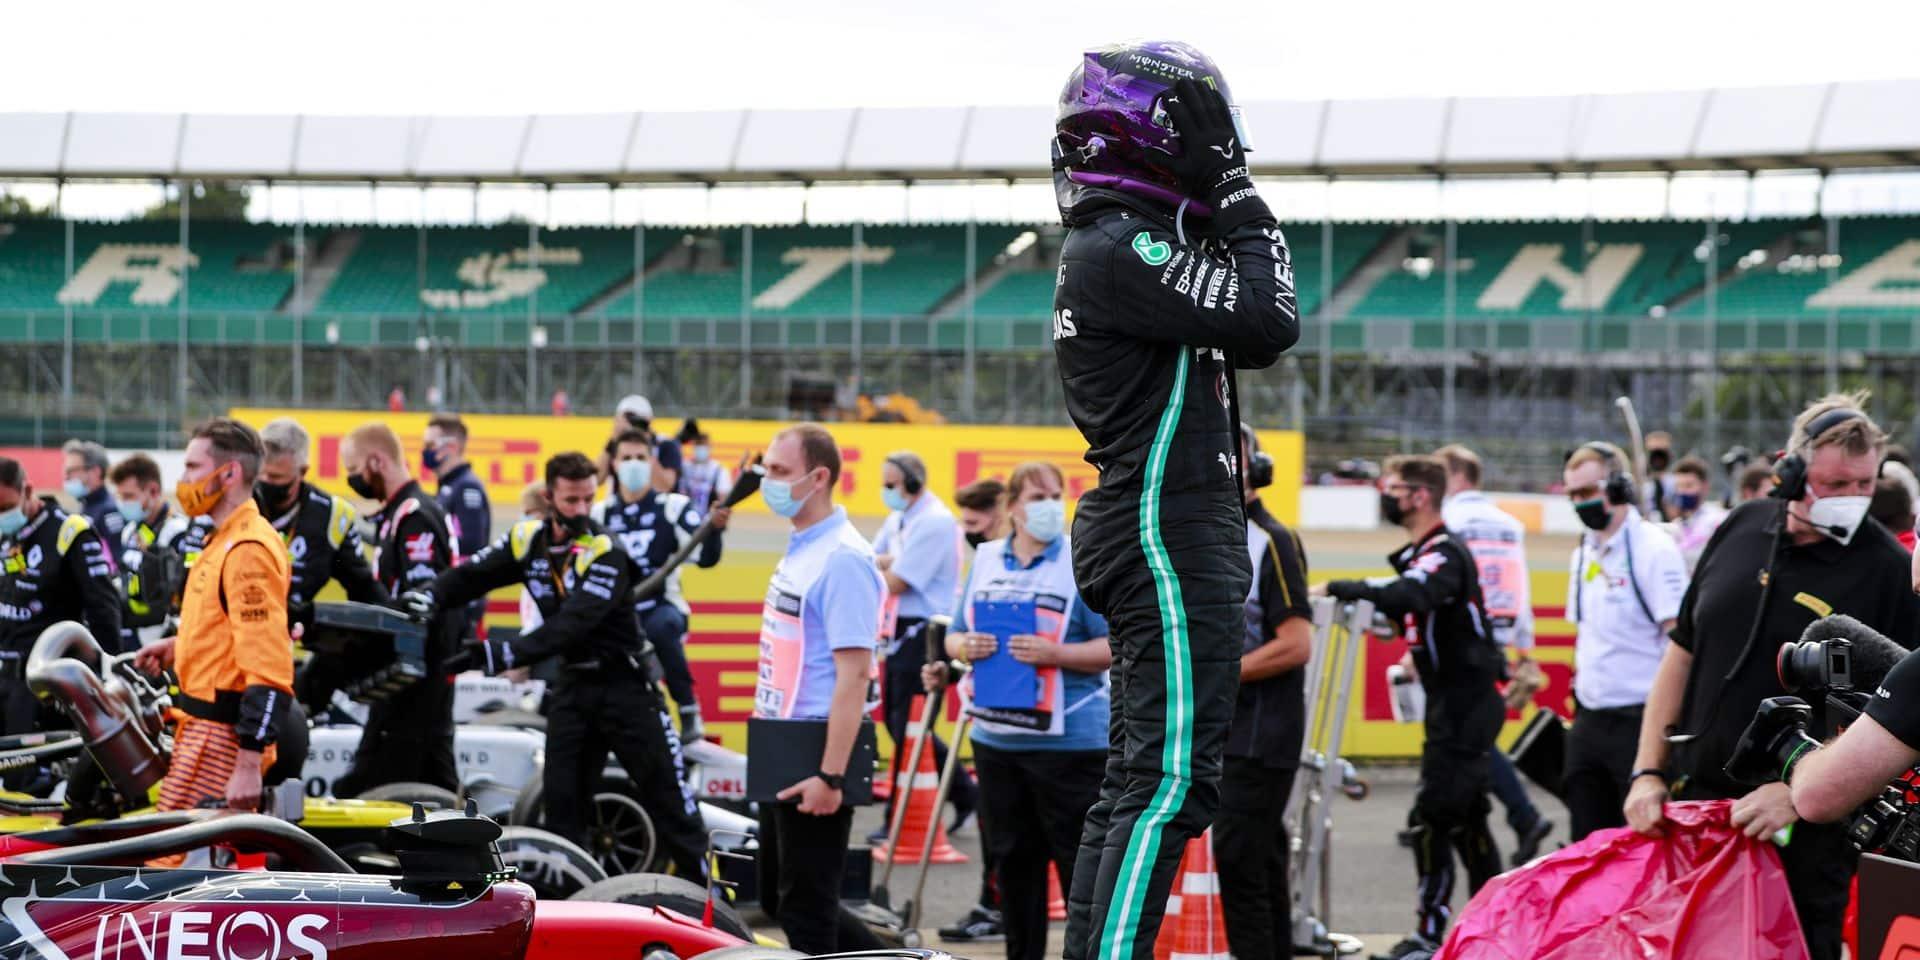 Hamilton et Pirelli, juste éclatants !